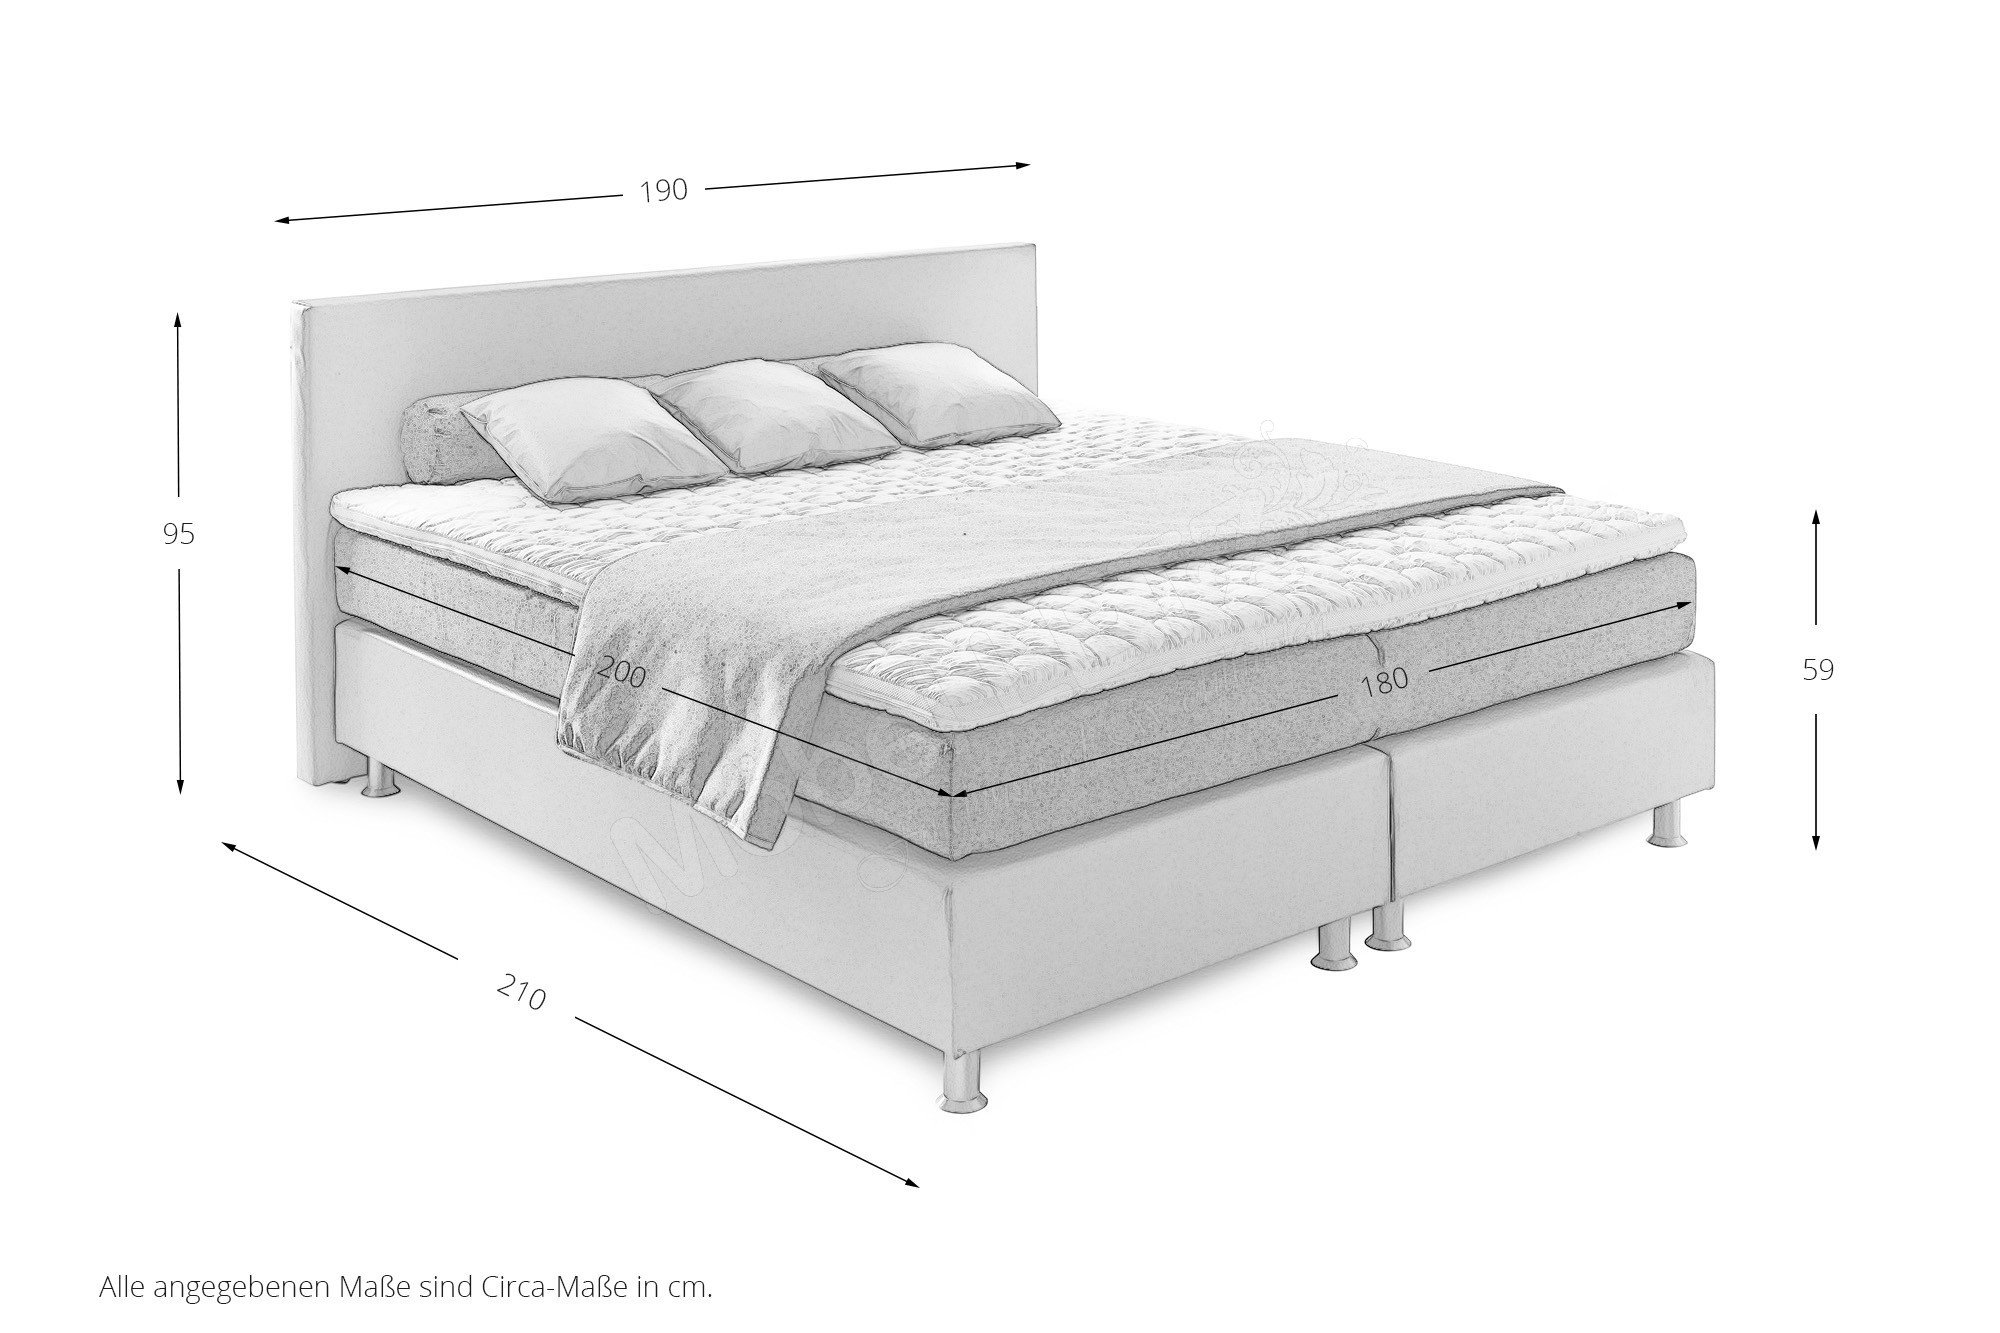 oschmann belcanto luxus boxspringbett in kunstleder beige m bel letz ihr online shop. Black Bedroom Furniture Sets. Home Design Ideas